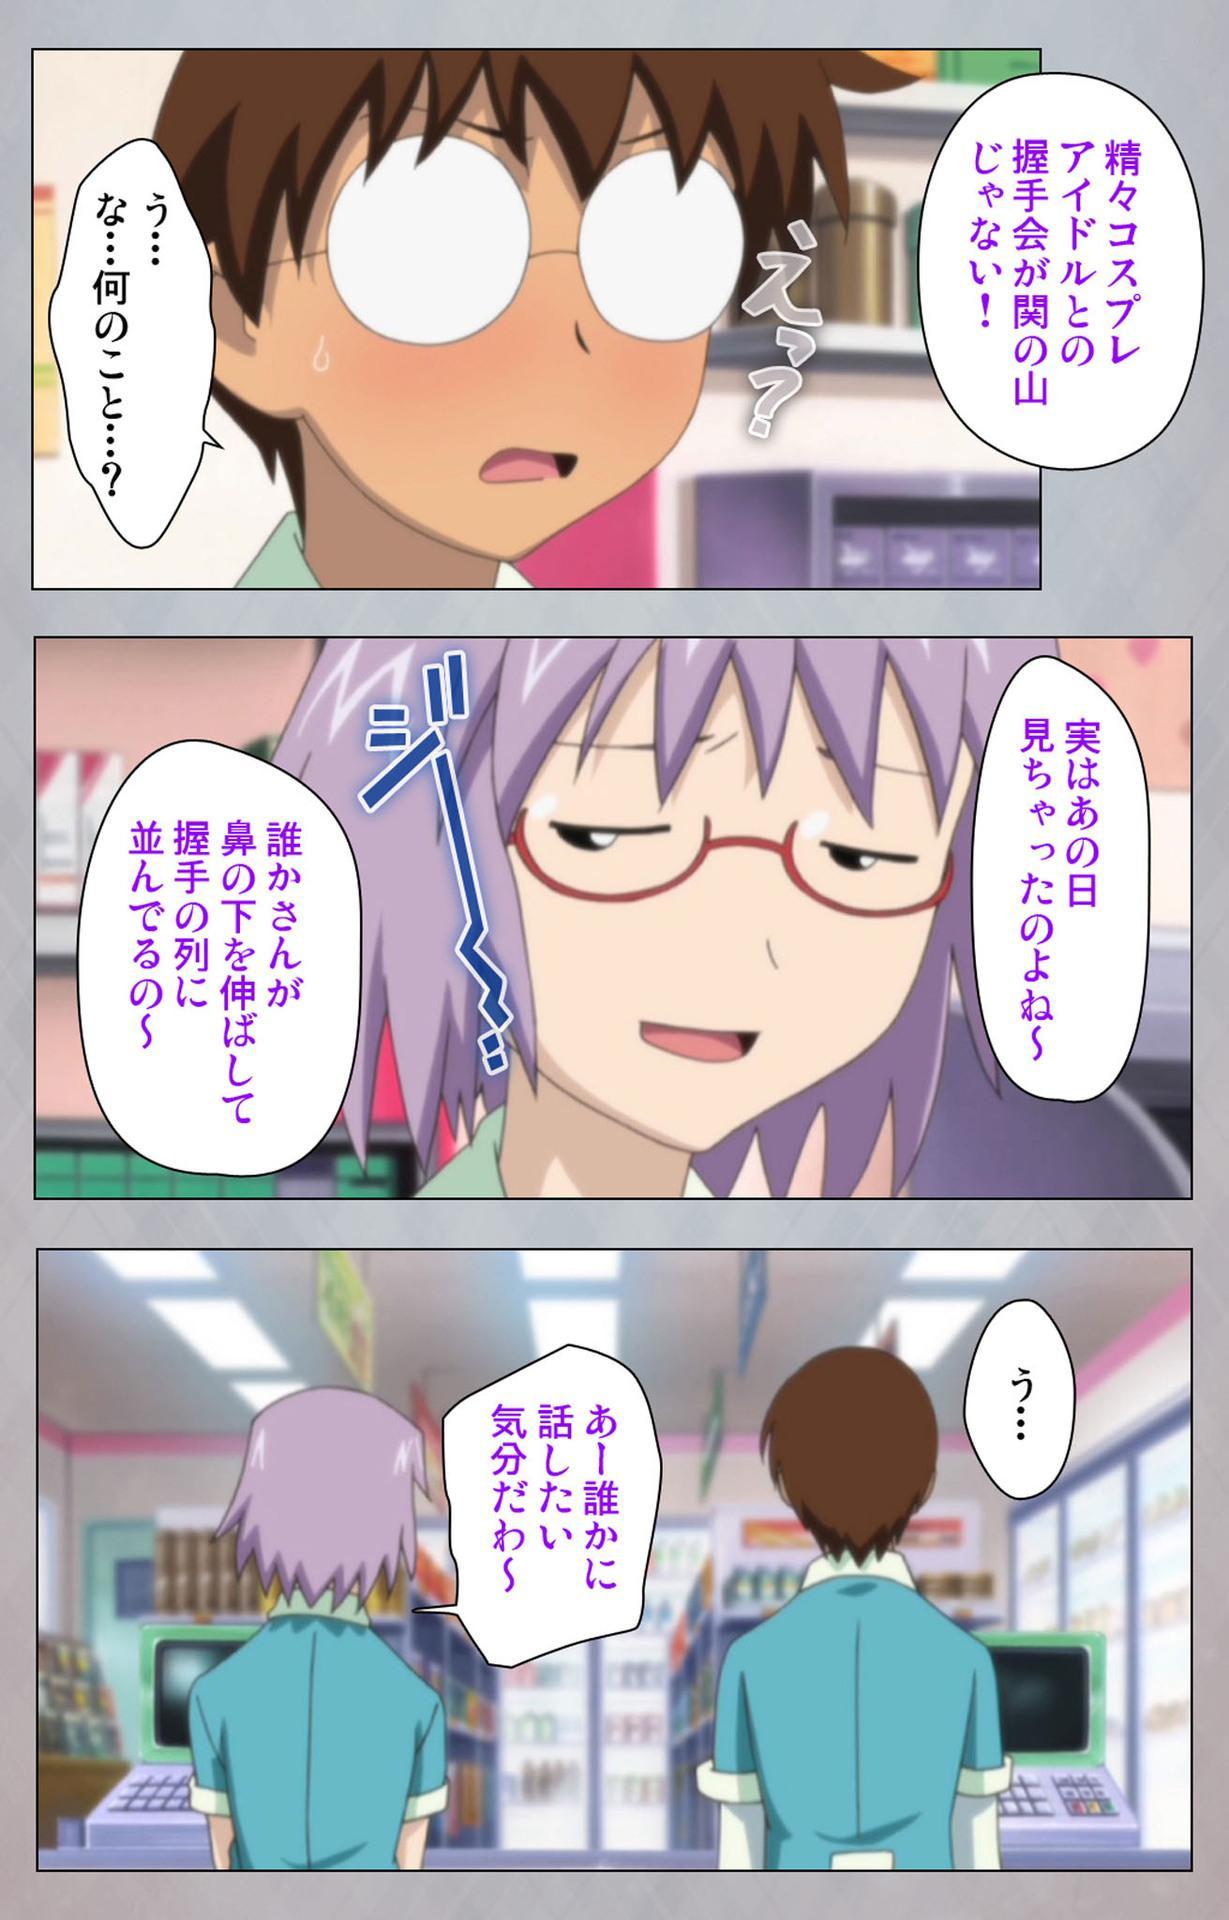 [Digital Works] [Full Color Seijin Ban] Sex Android ~Risou no Onna de Nuite yaru~ Kanzenban 60